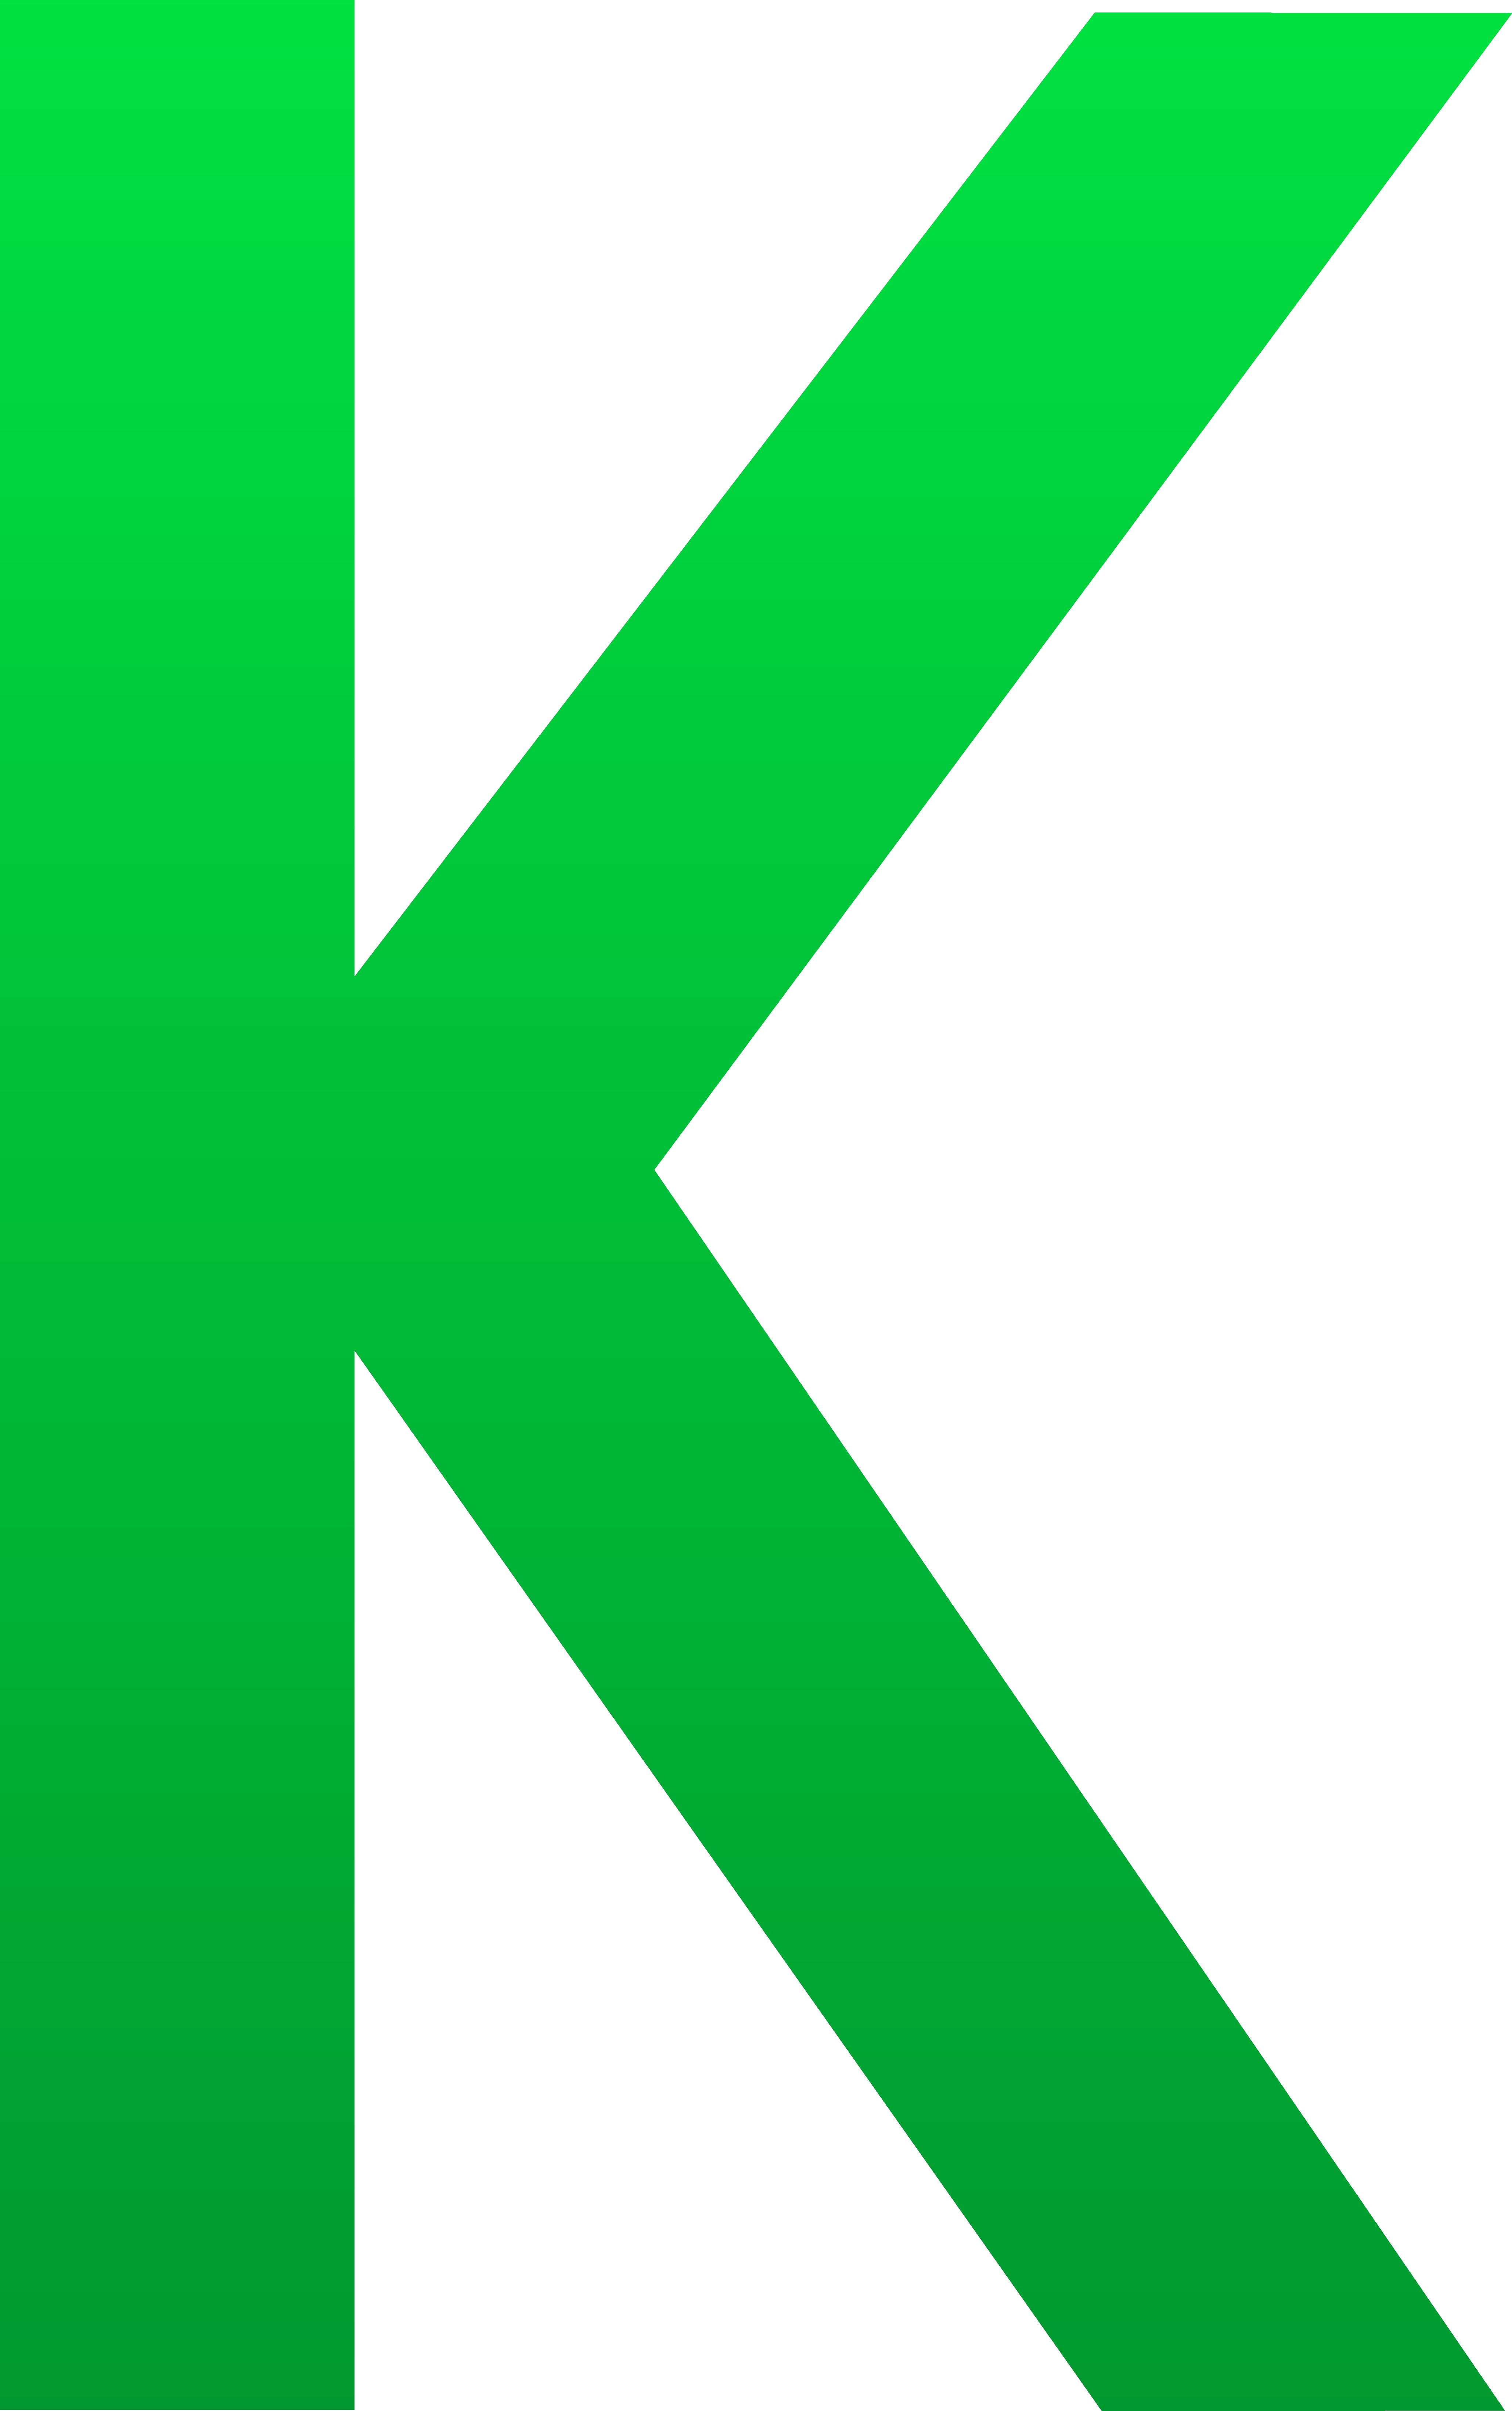 The Letter K.